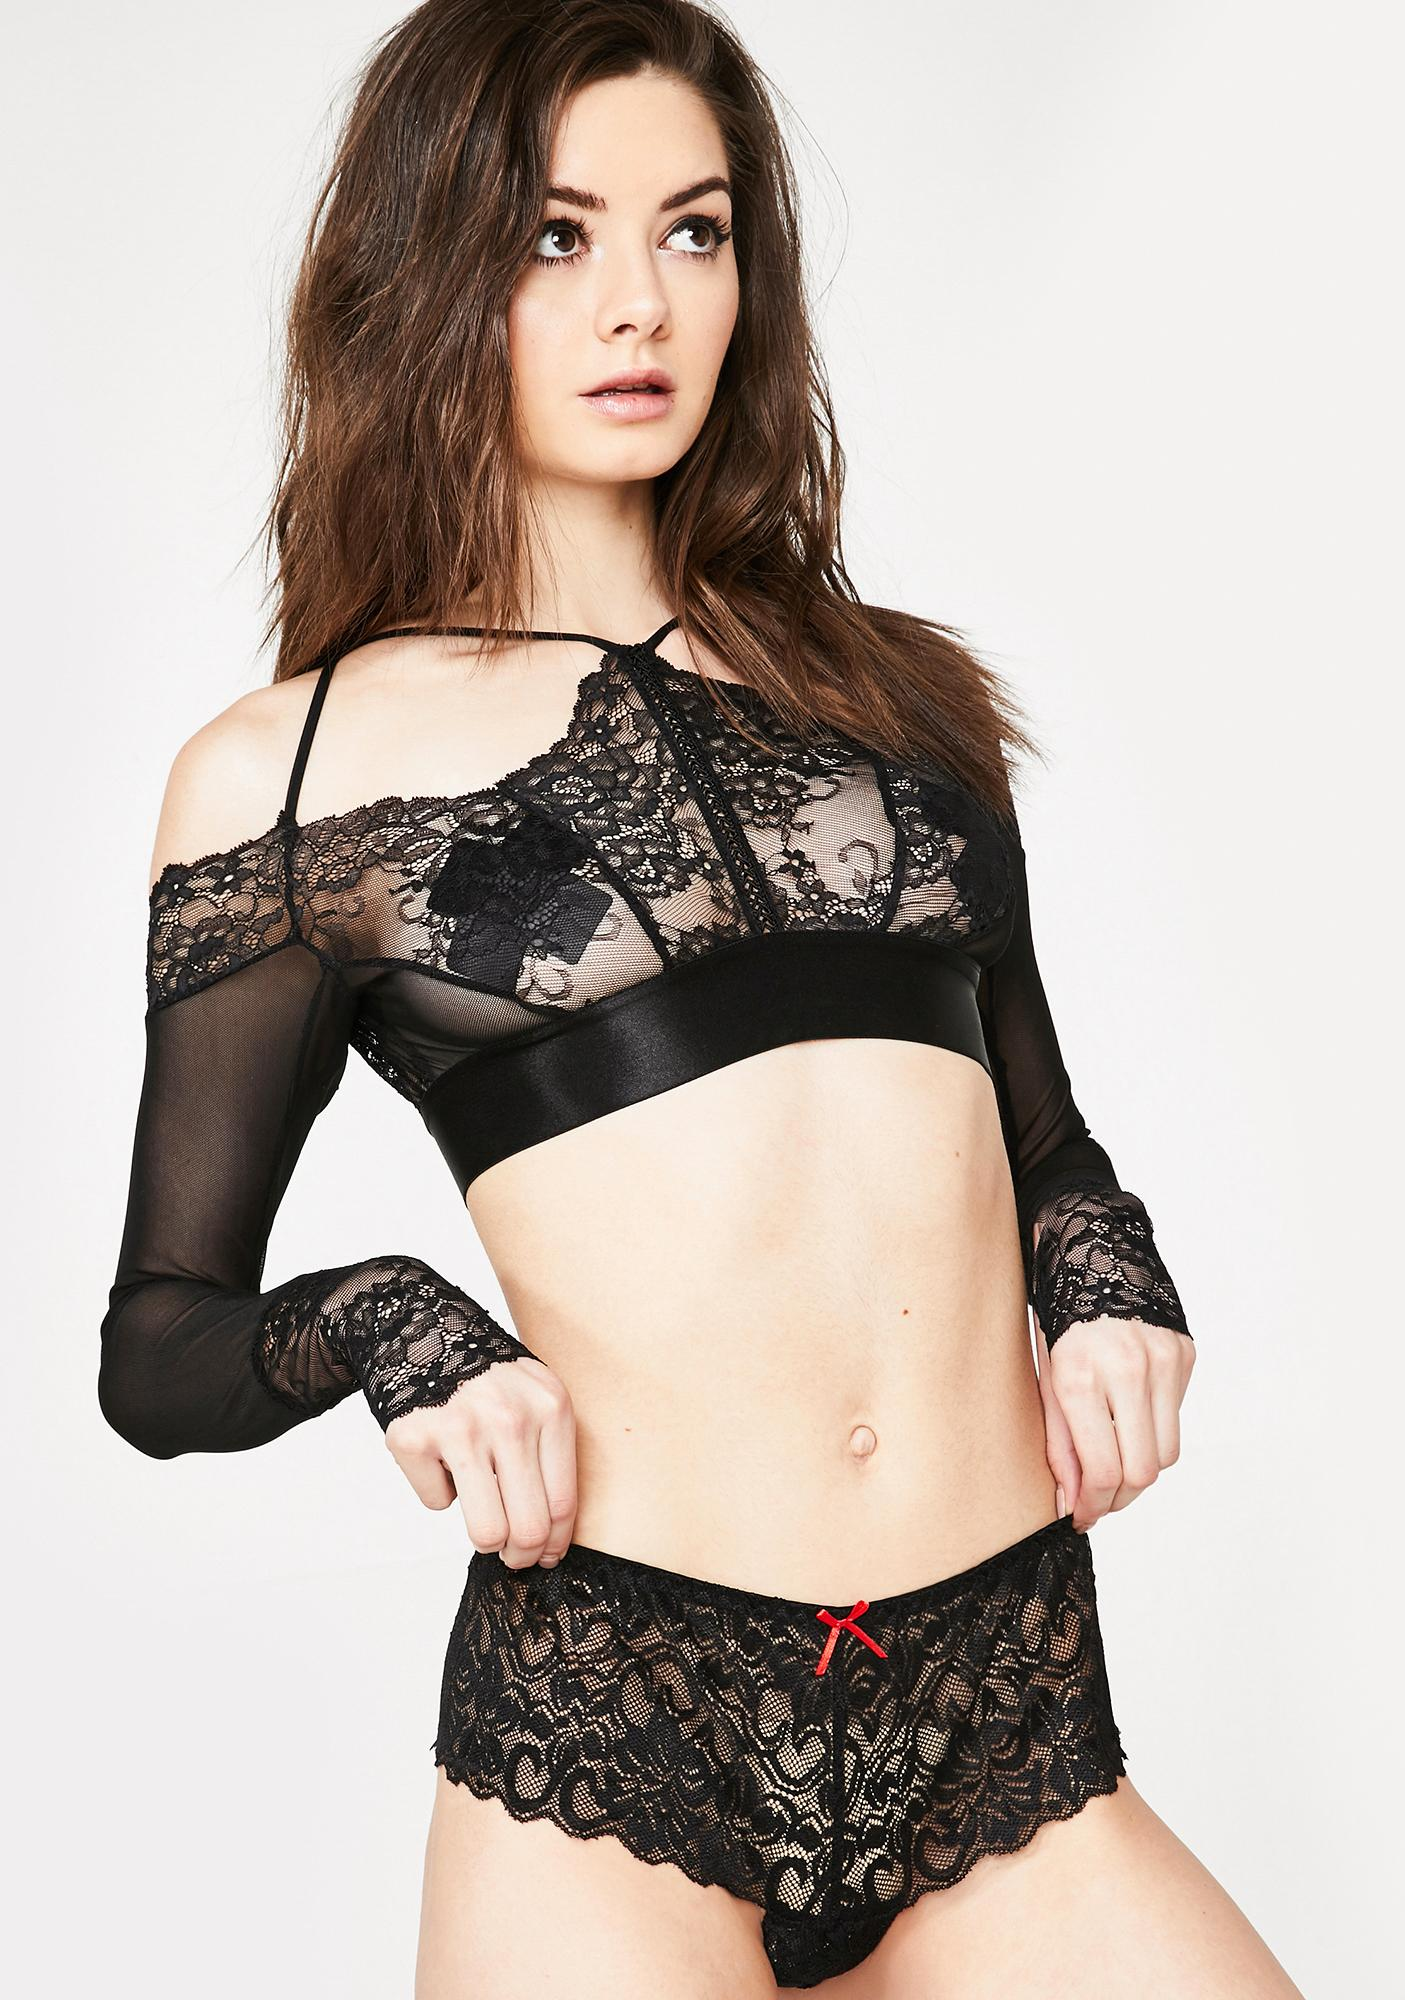 Dark Nobody's Baby Lace Panties